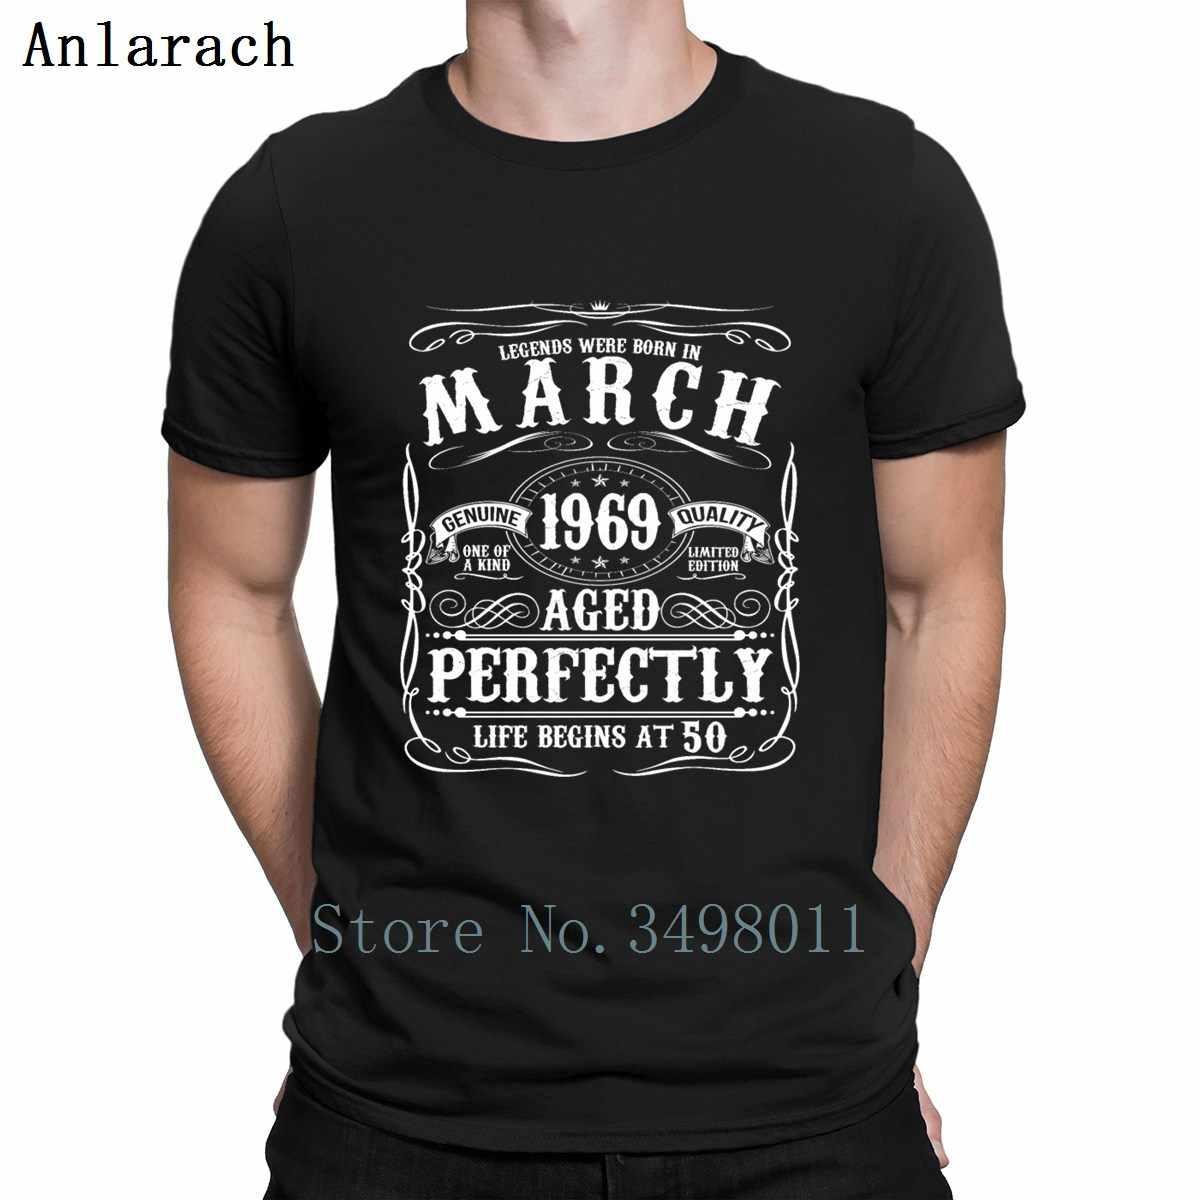 8a4b7f5e7 Funny March 50th Birthday Apparel Born 1969 T Shirt Printing 100% Cotton  Crew Neck Standard